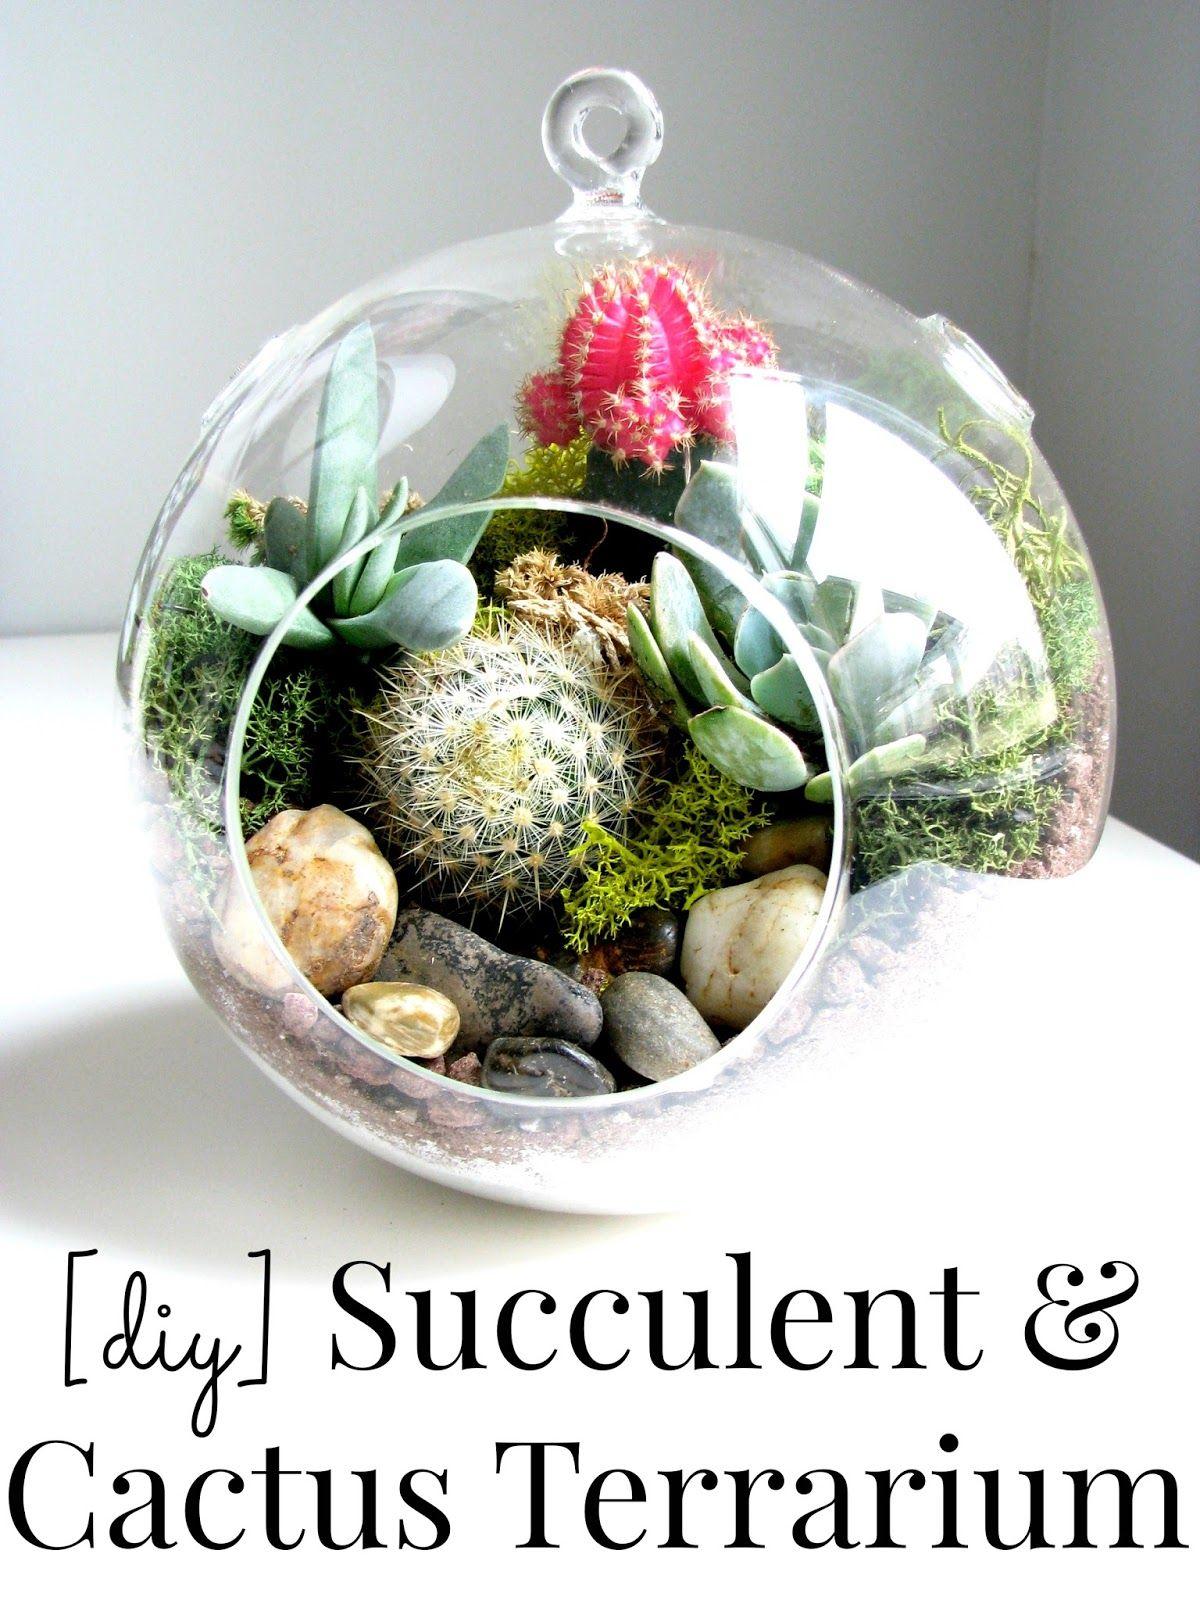 Life Love Larson Look For Less Challenge Diy Succulent Cactus